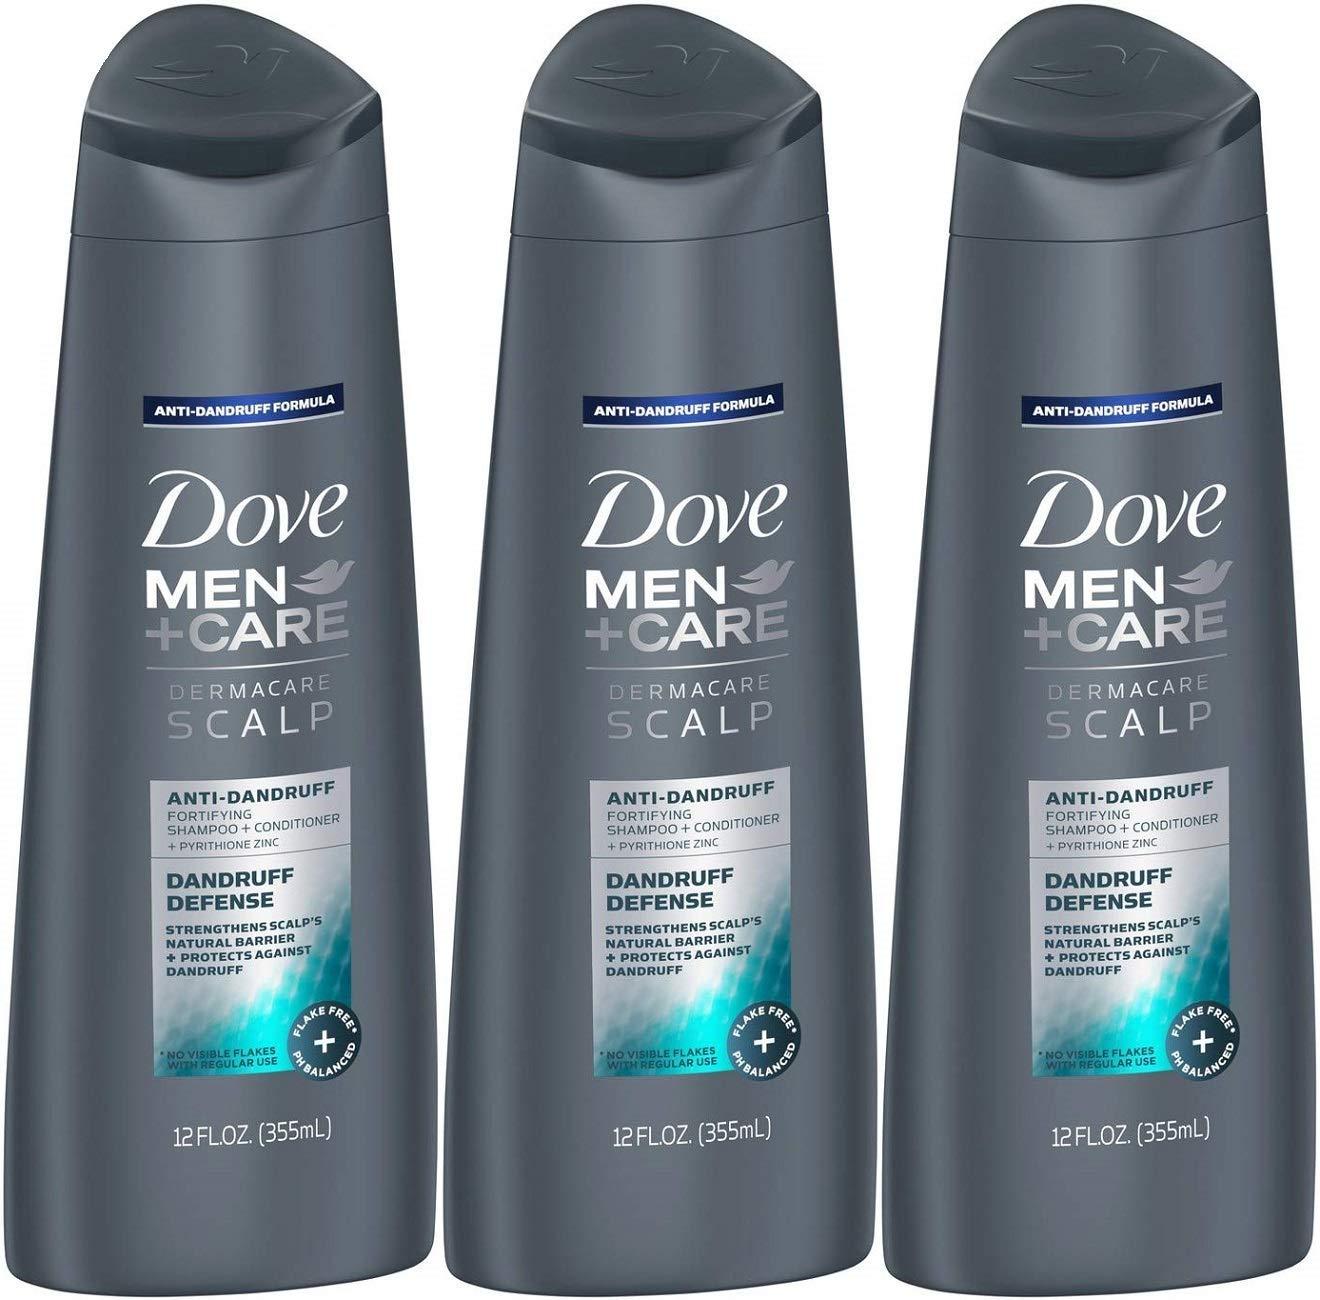 Dove Men+Care Dermacare Scalp 2-in-1 Shampoo & Conditioner, Dandruff Defense, 12 Ounce (Pack of 3)